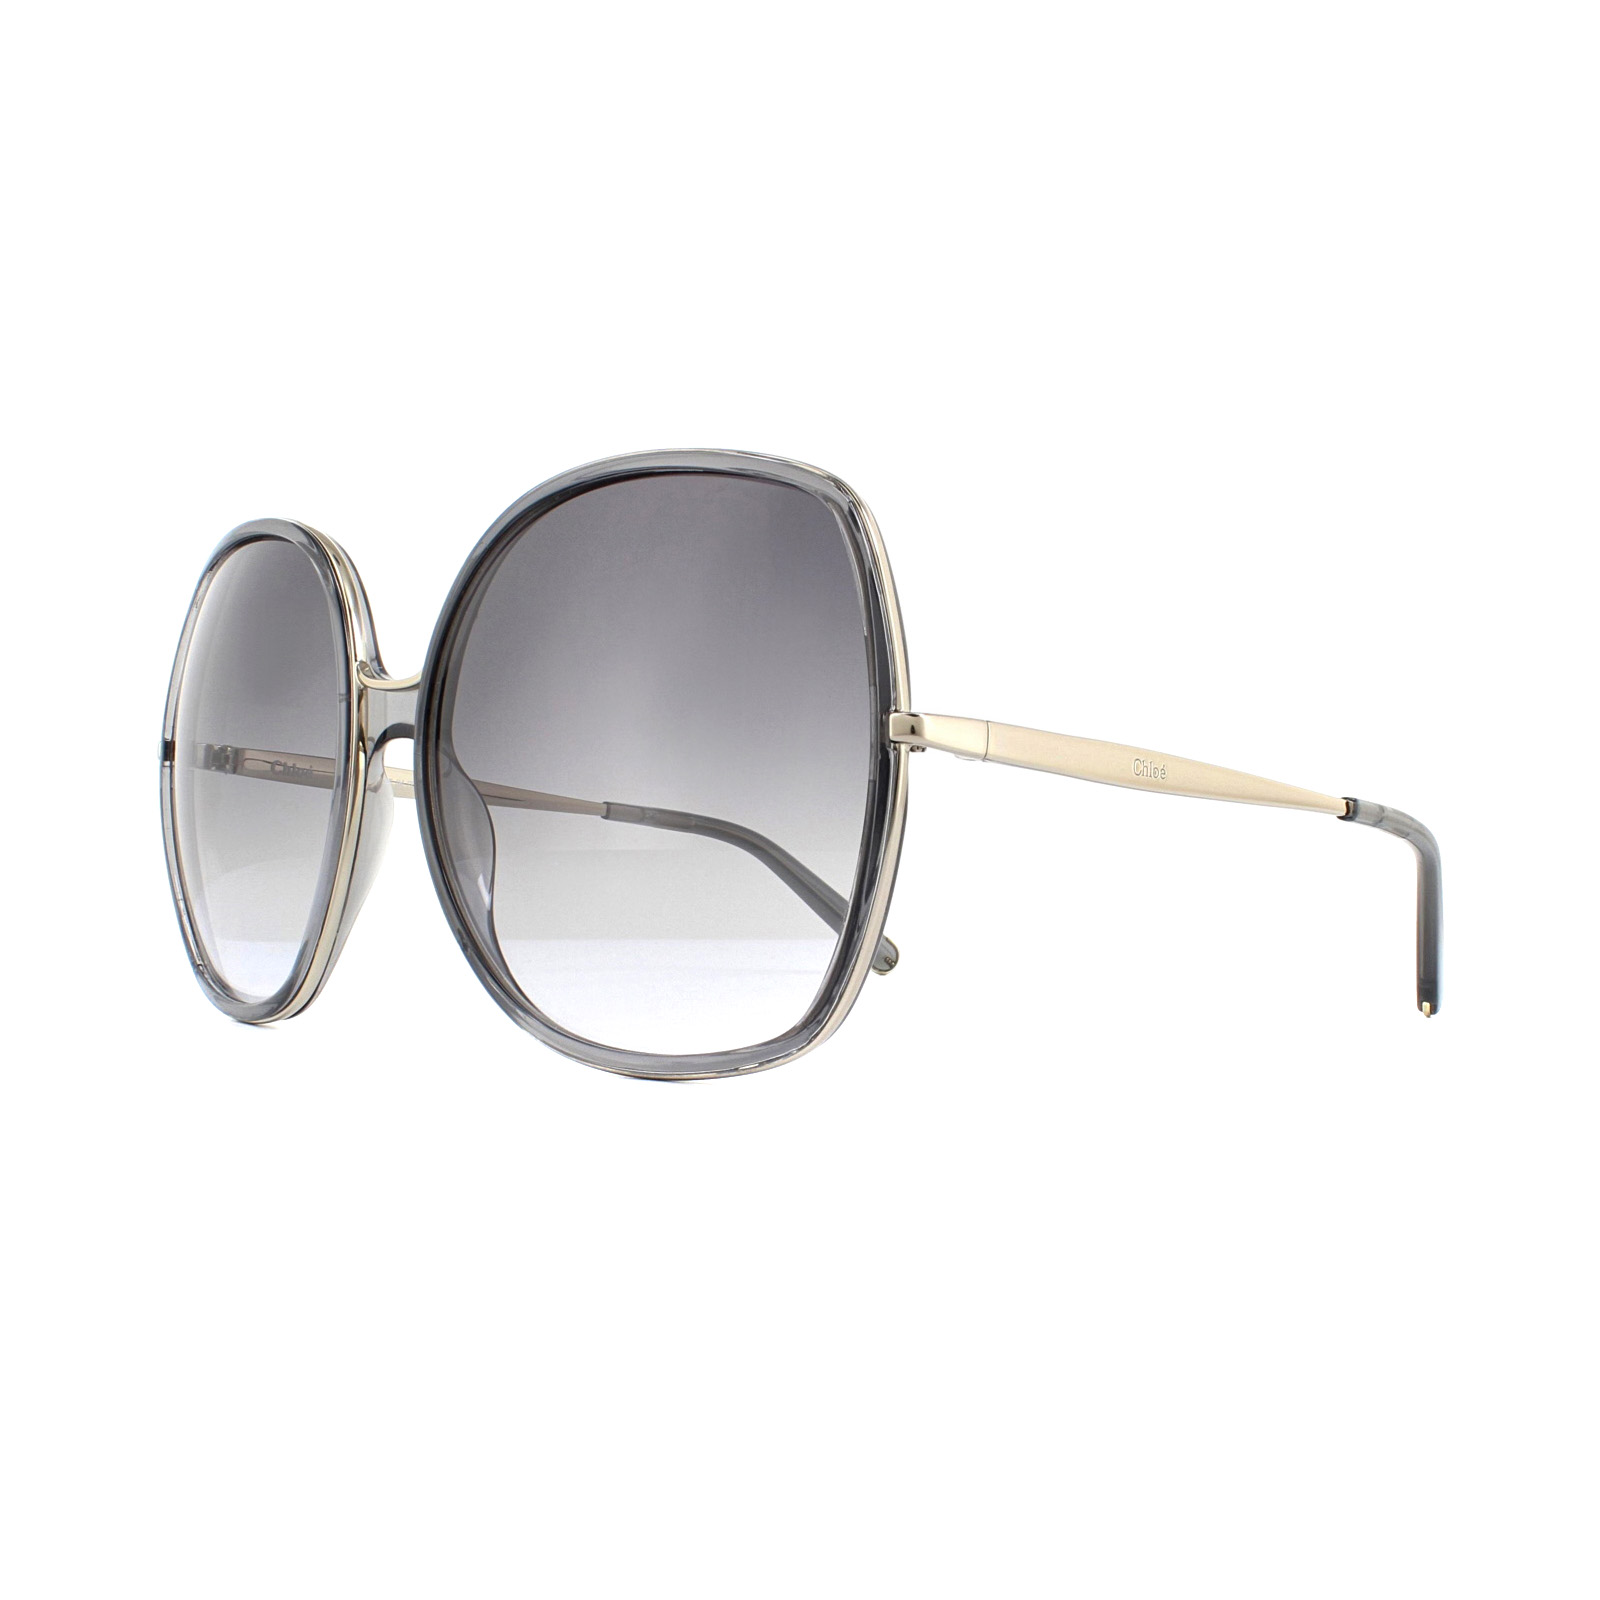 83d98b7412a Cheap Chloe CE725S Sunglasses - Discounted Sunglasses